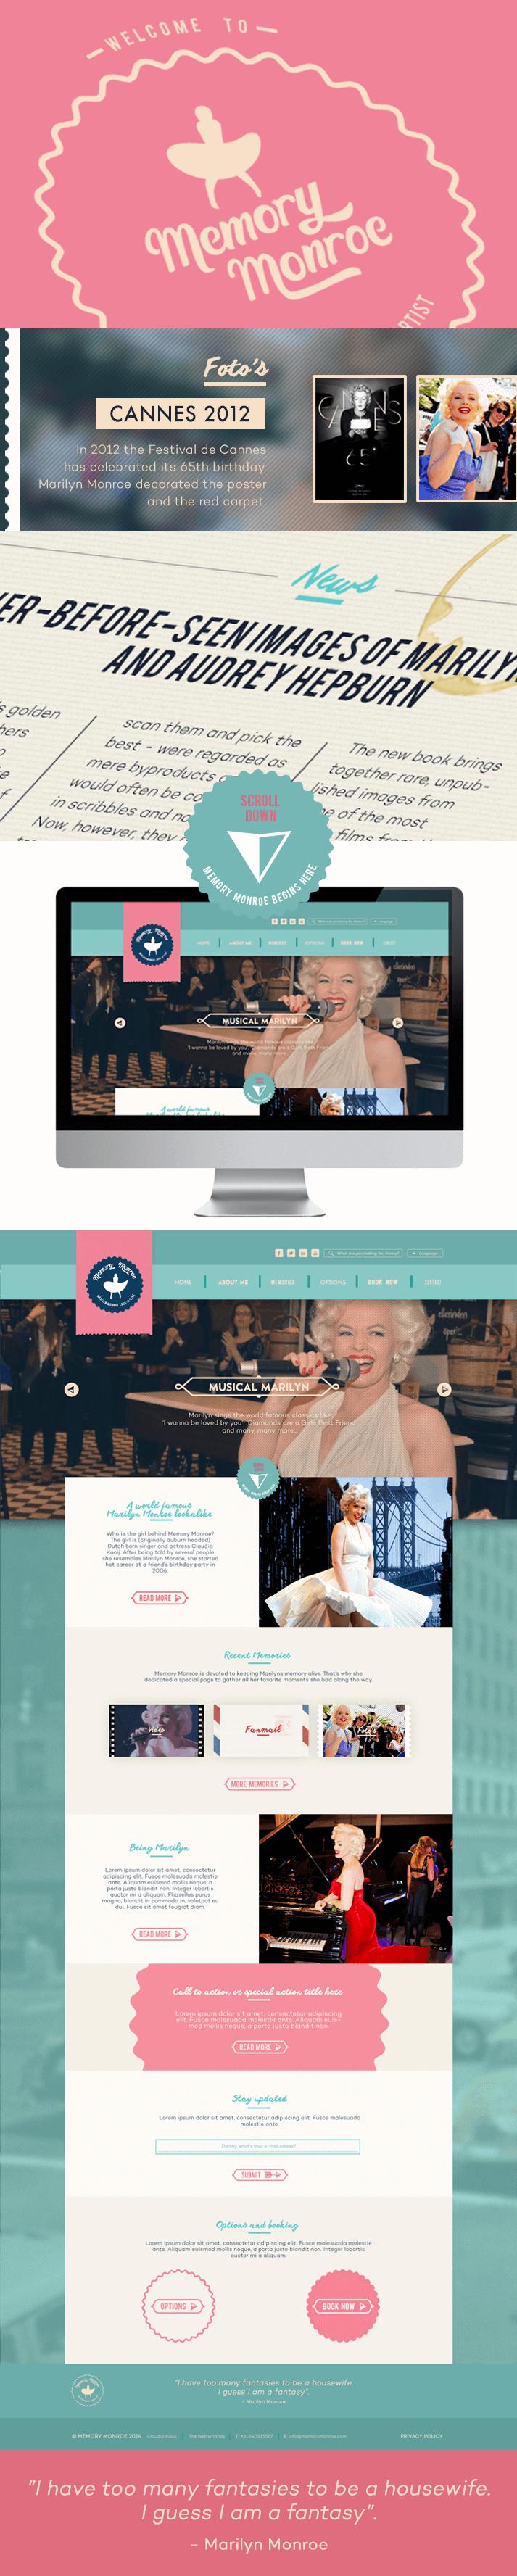 Memory Monroe webdesign